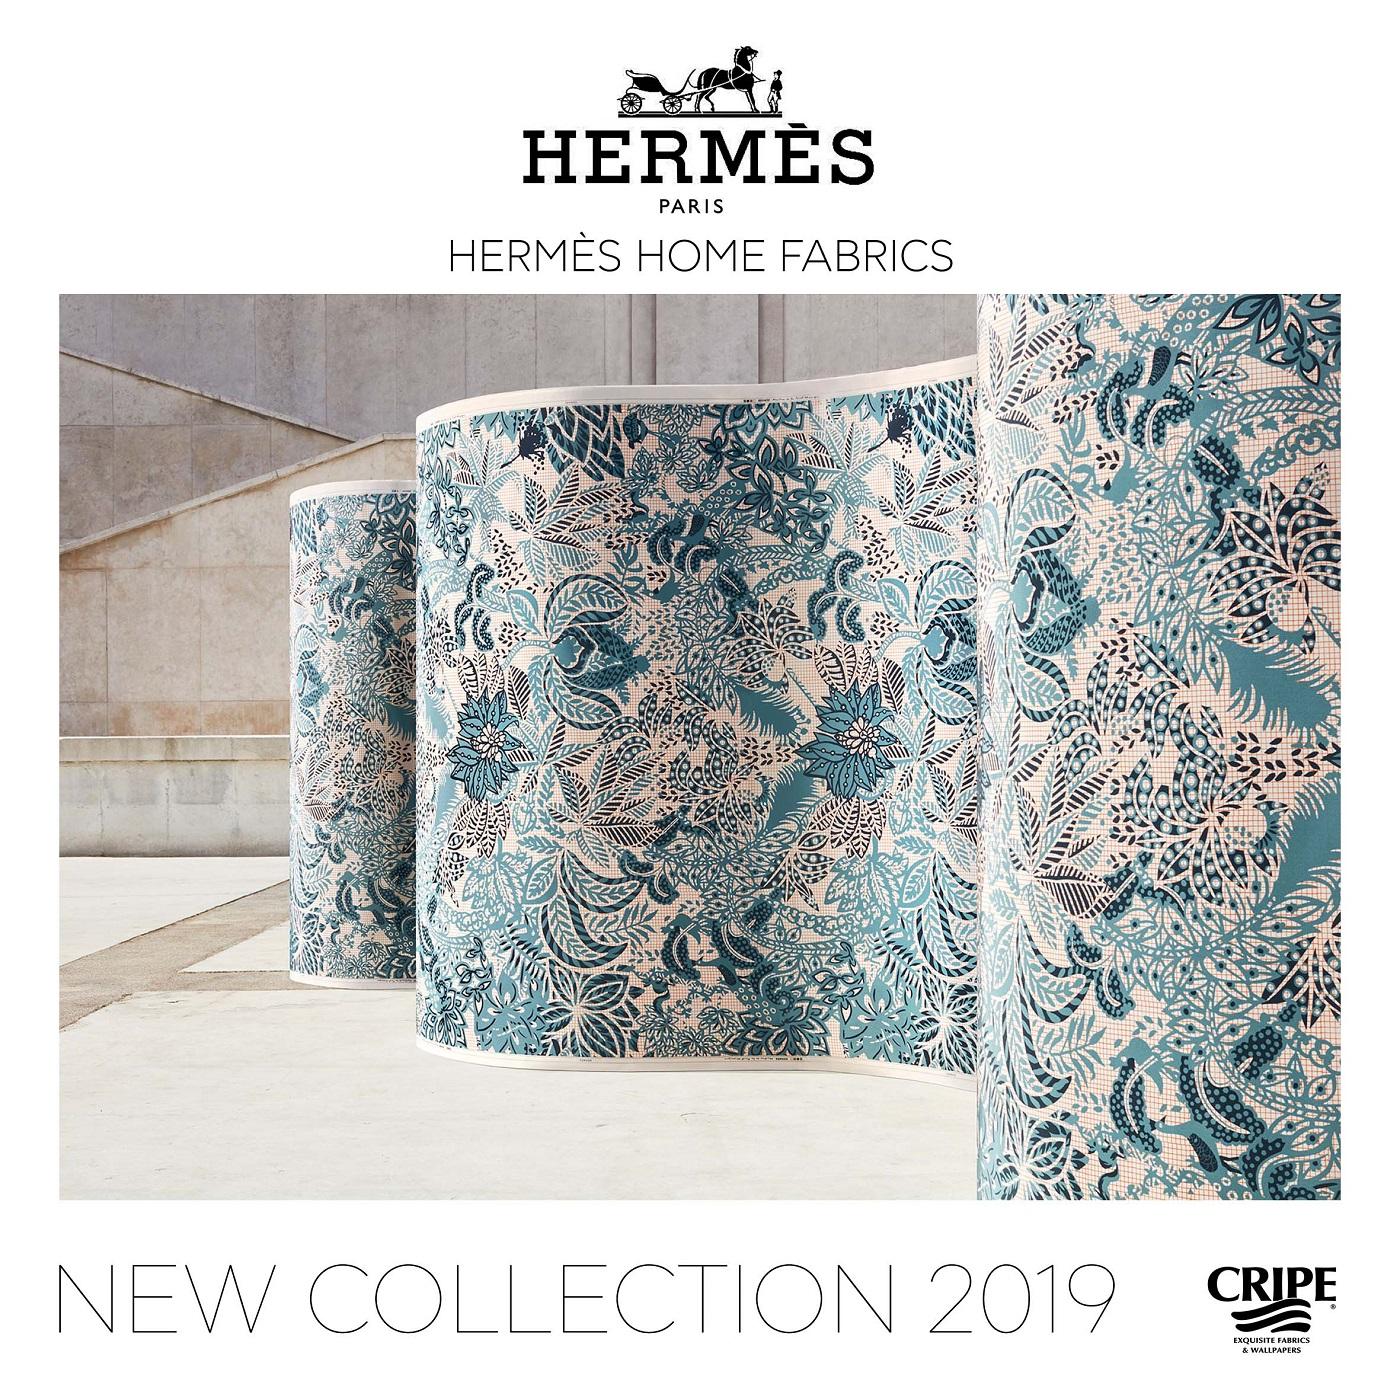 HERMES-2019-CRIPE-PRESENTATION 27